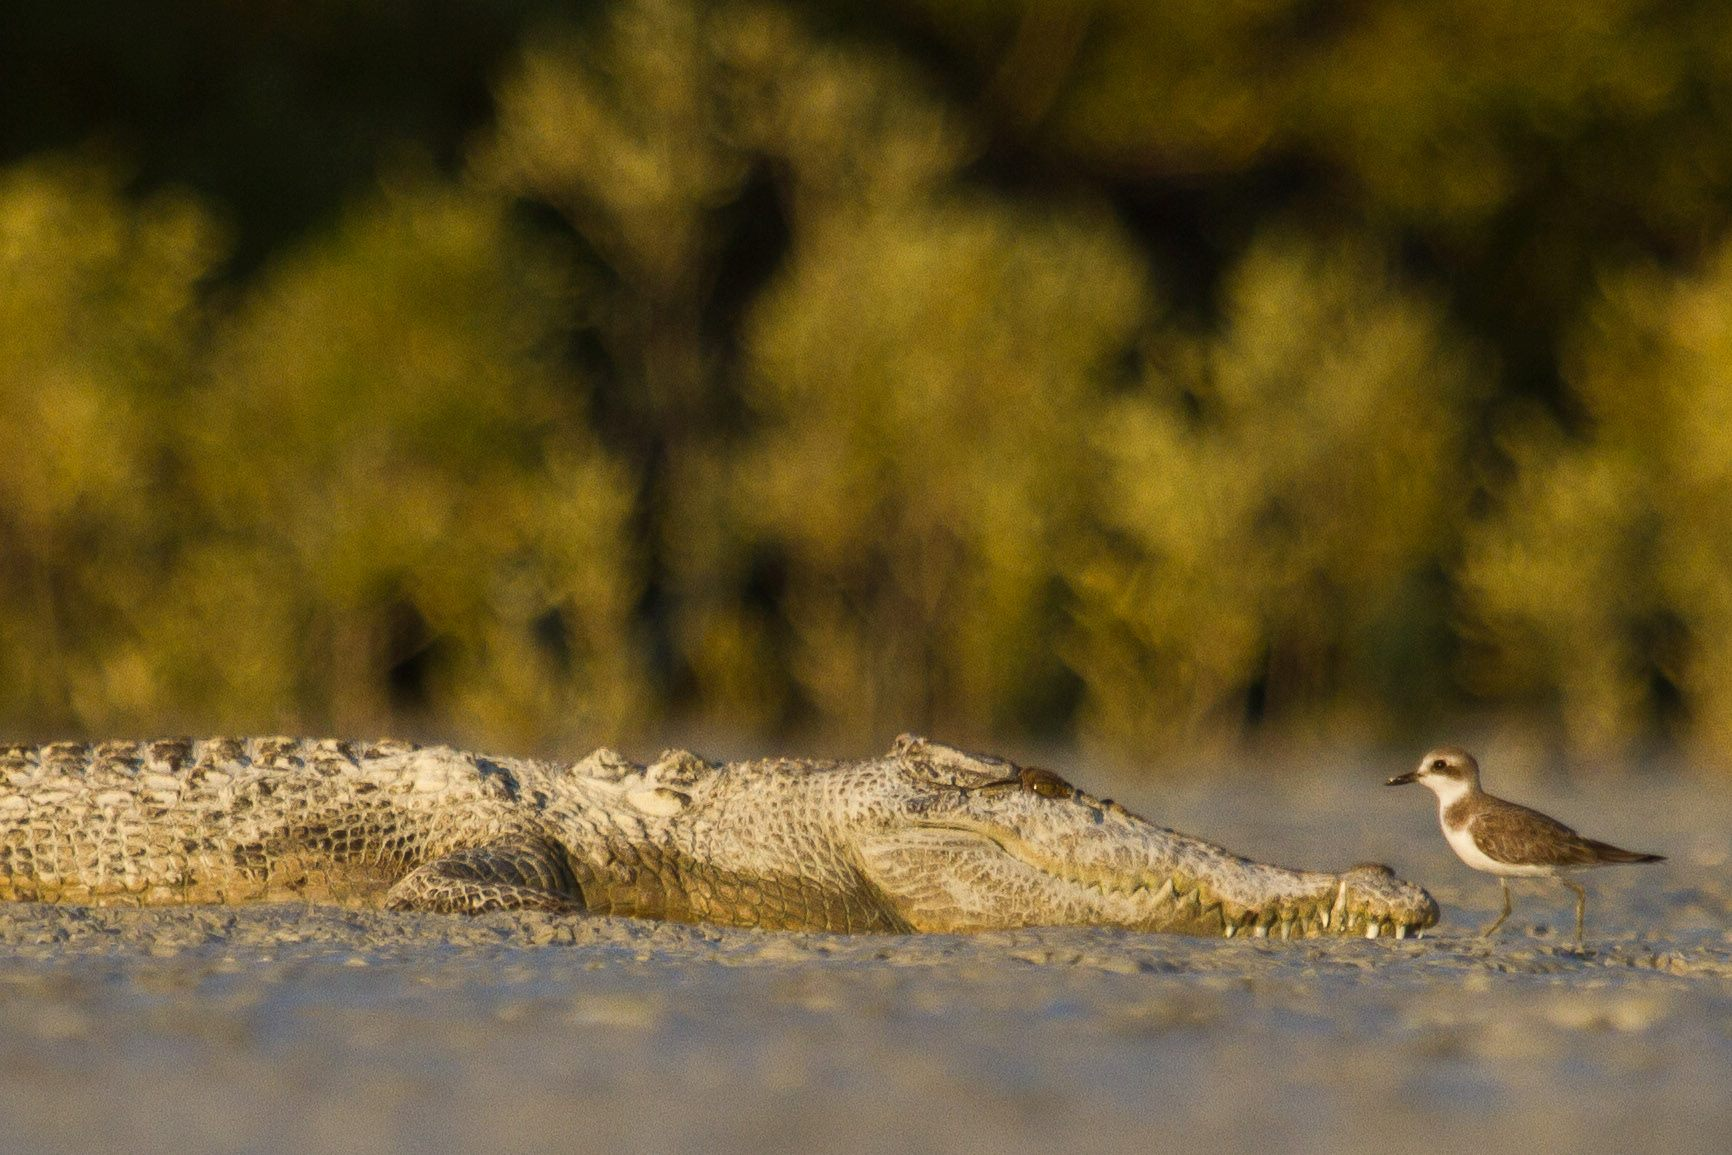 Although rarely seen, Estuarine Crocodiles (salties!) do occur in Roebuck Bay. Photo: Nigel Jackett